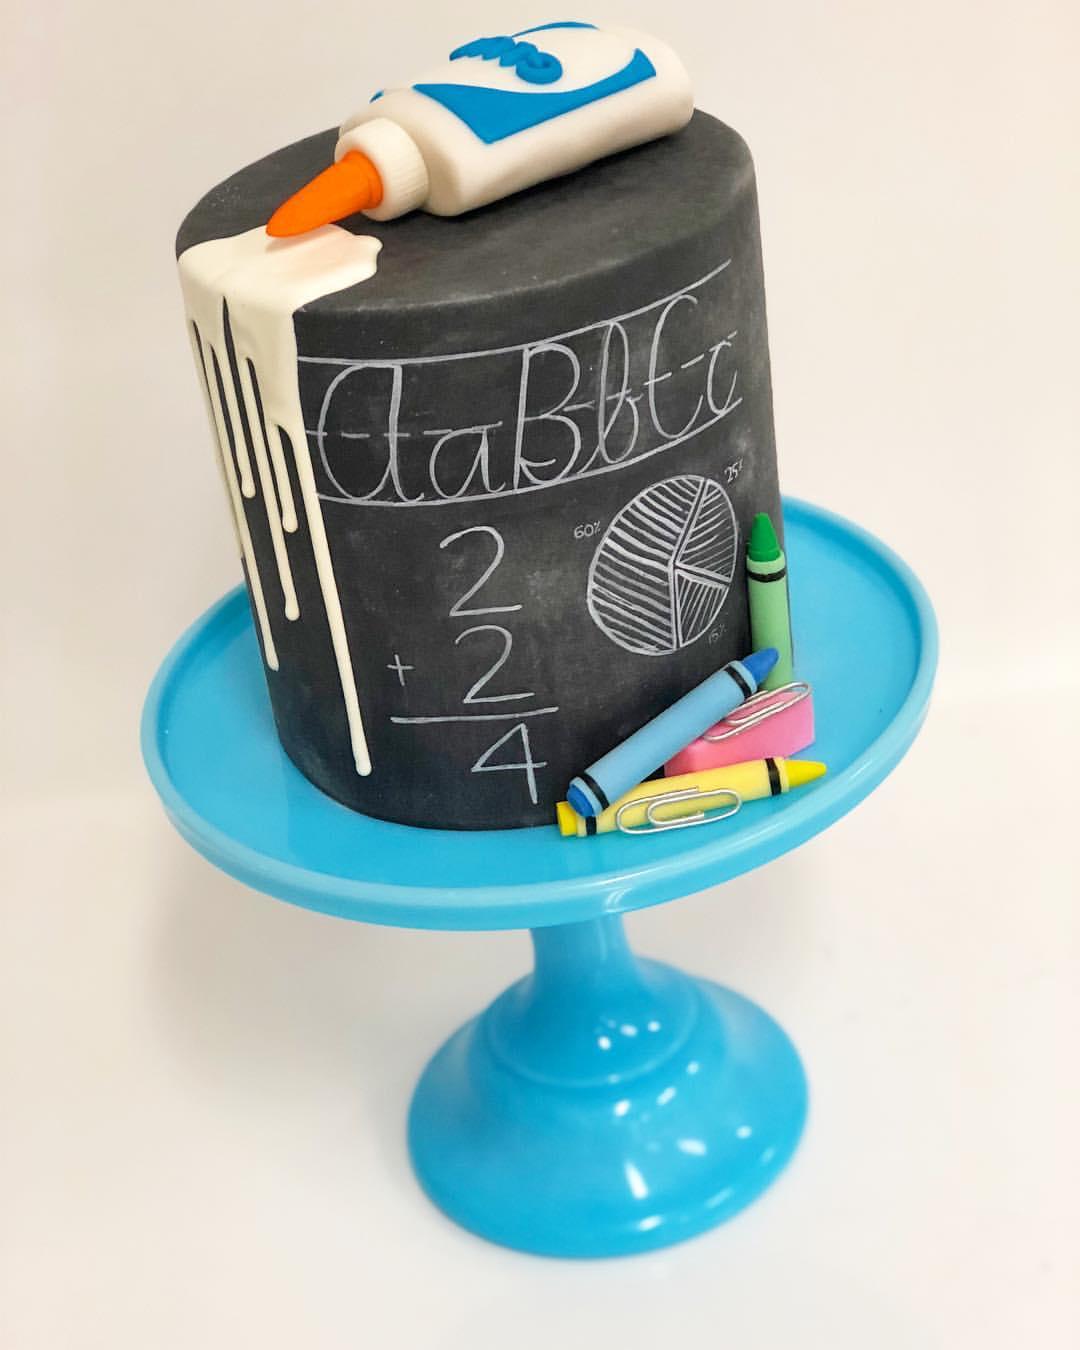 Pin by Ana Jiménez on Cake for Children's Bdays Themed